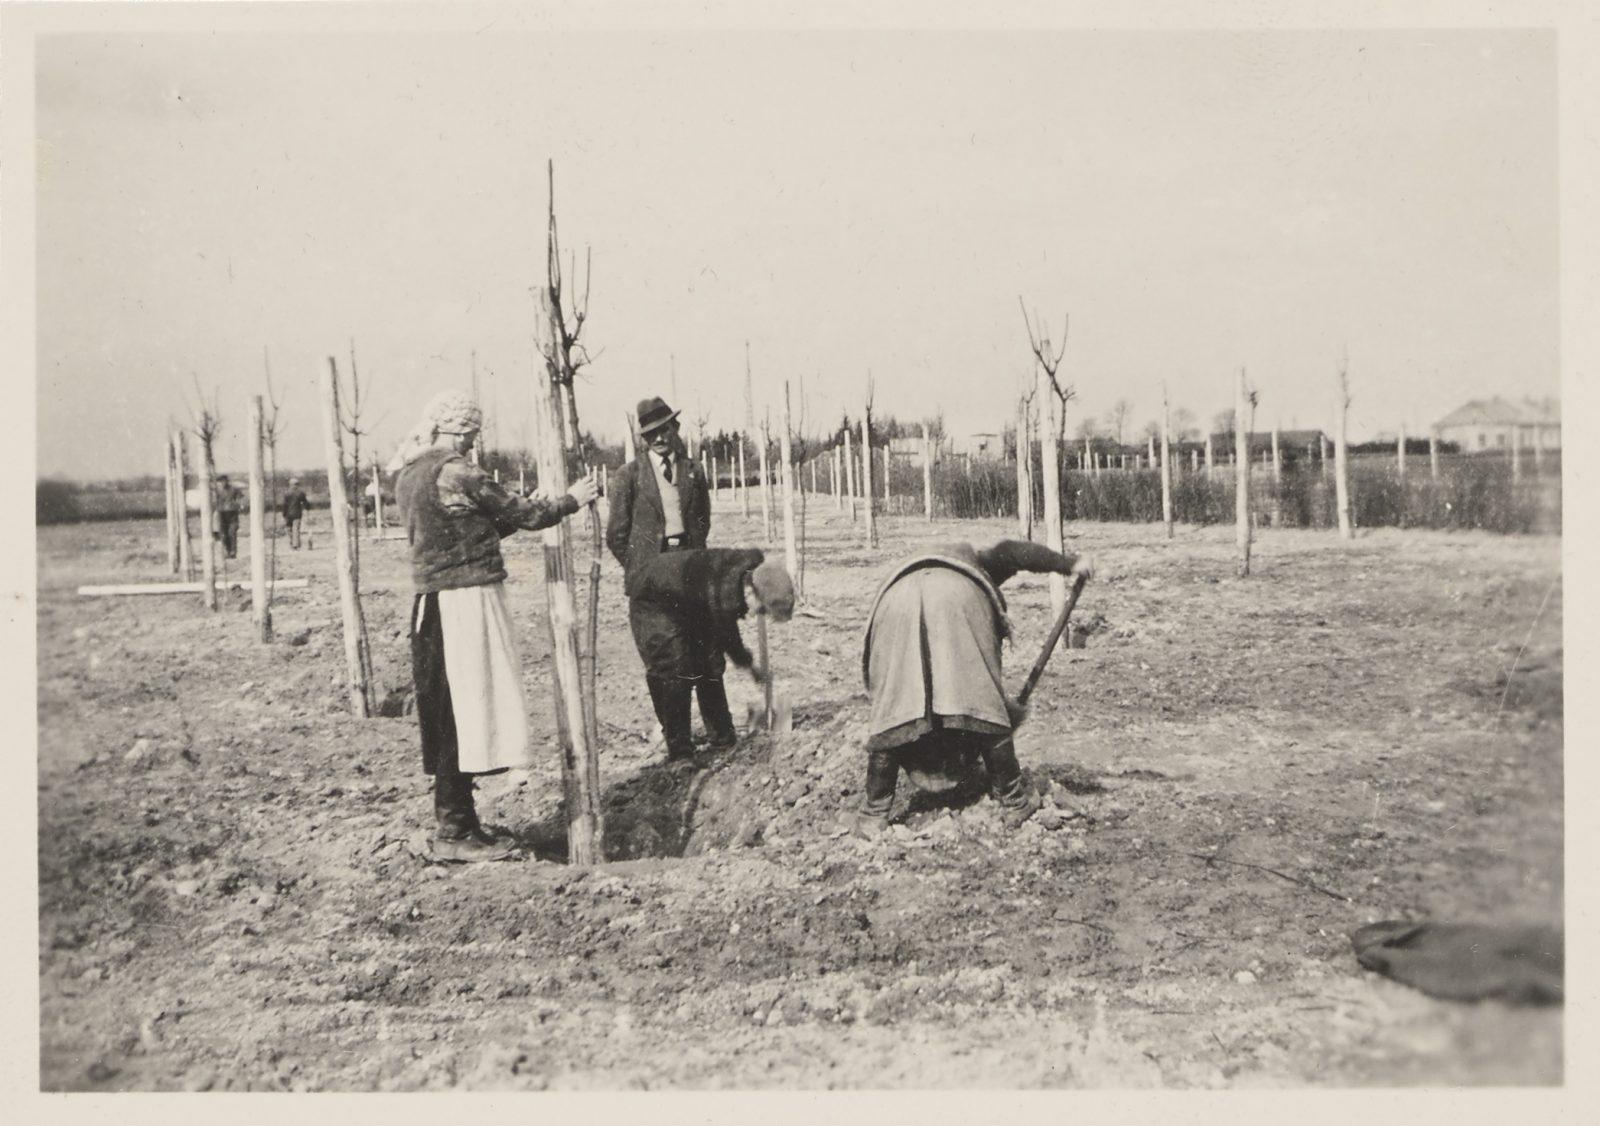 Photo album showing the construction of the horse racing track in Służewiec, photo Tadeusz Giżycki, 1936–1939 Polish Horse Racing Club in Warsaw, item no. 5279, catalogue no. X/47